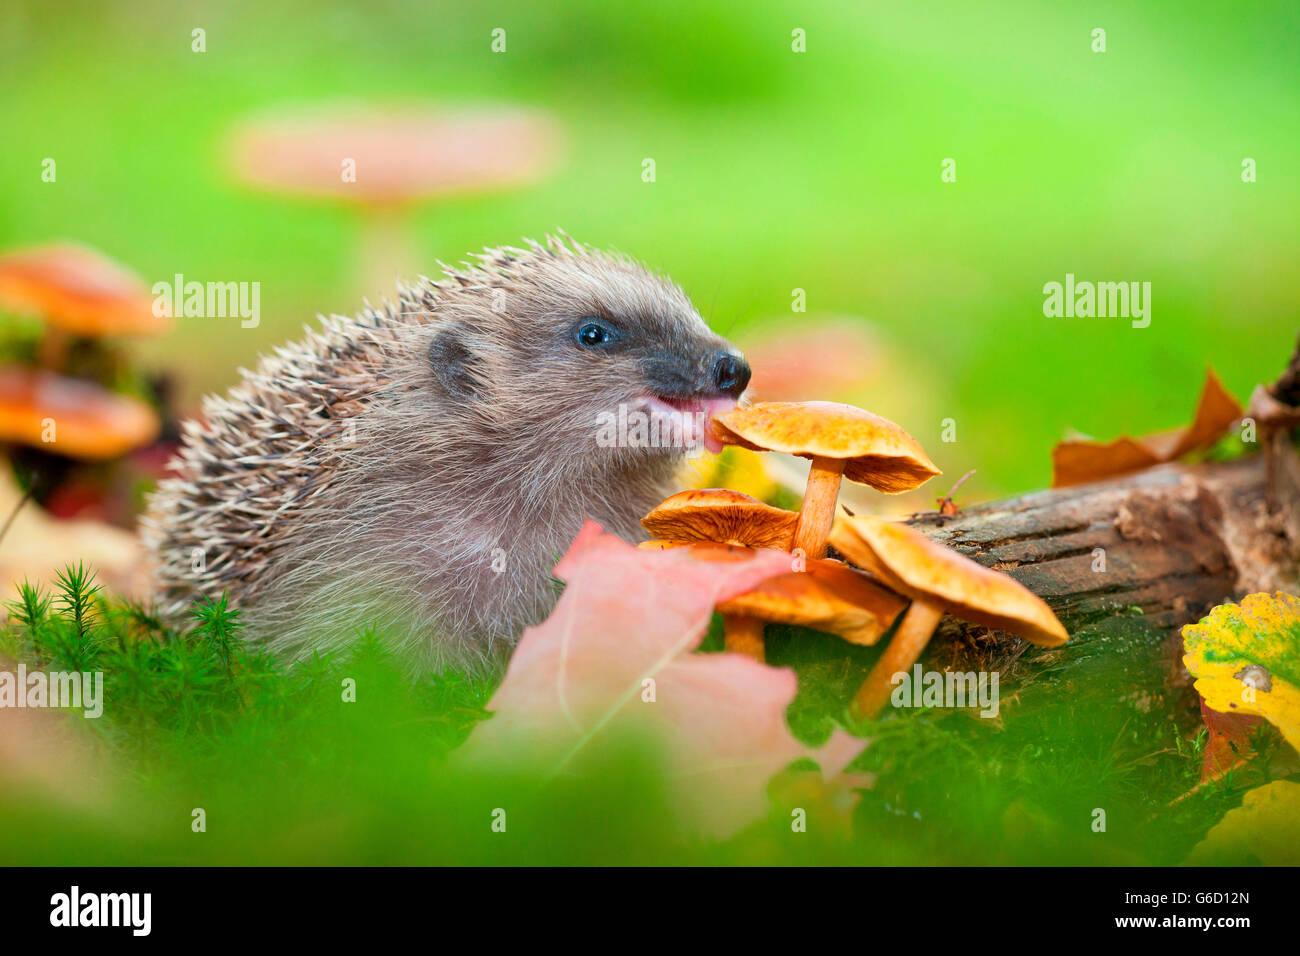 European hedgehog, nibbling mushrooms, Germany / (Erinaceus europaeus) - Stock Image